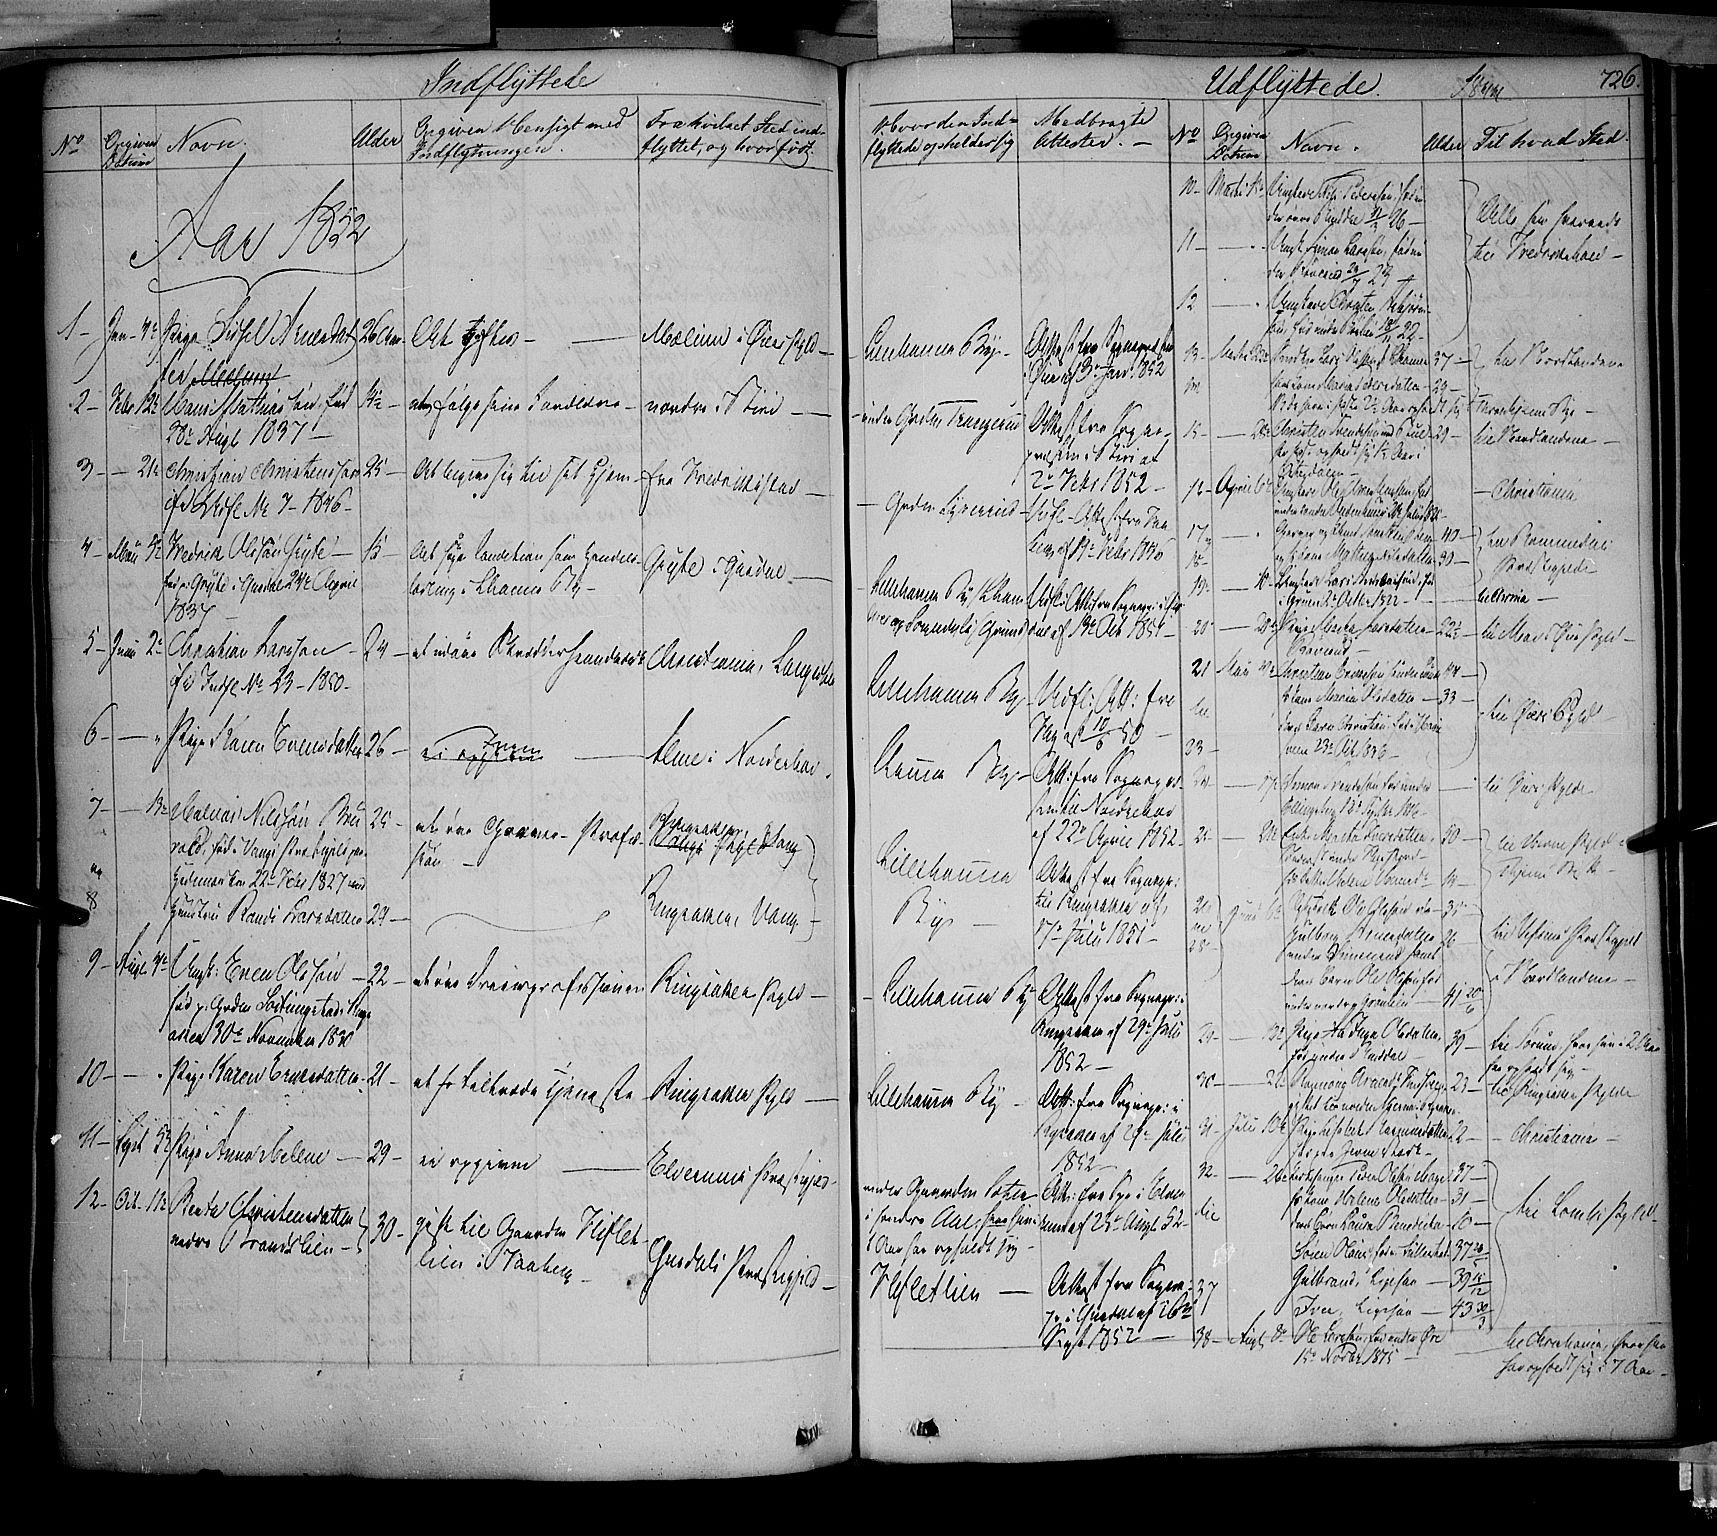 SAH, Fåberg prestekontor, Ministerialbok nr. 5, 1836-1854, s. 725-726